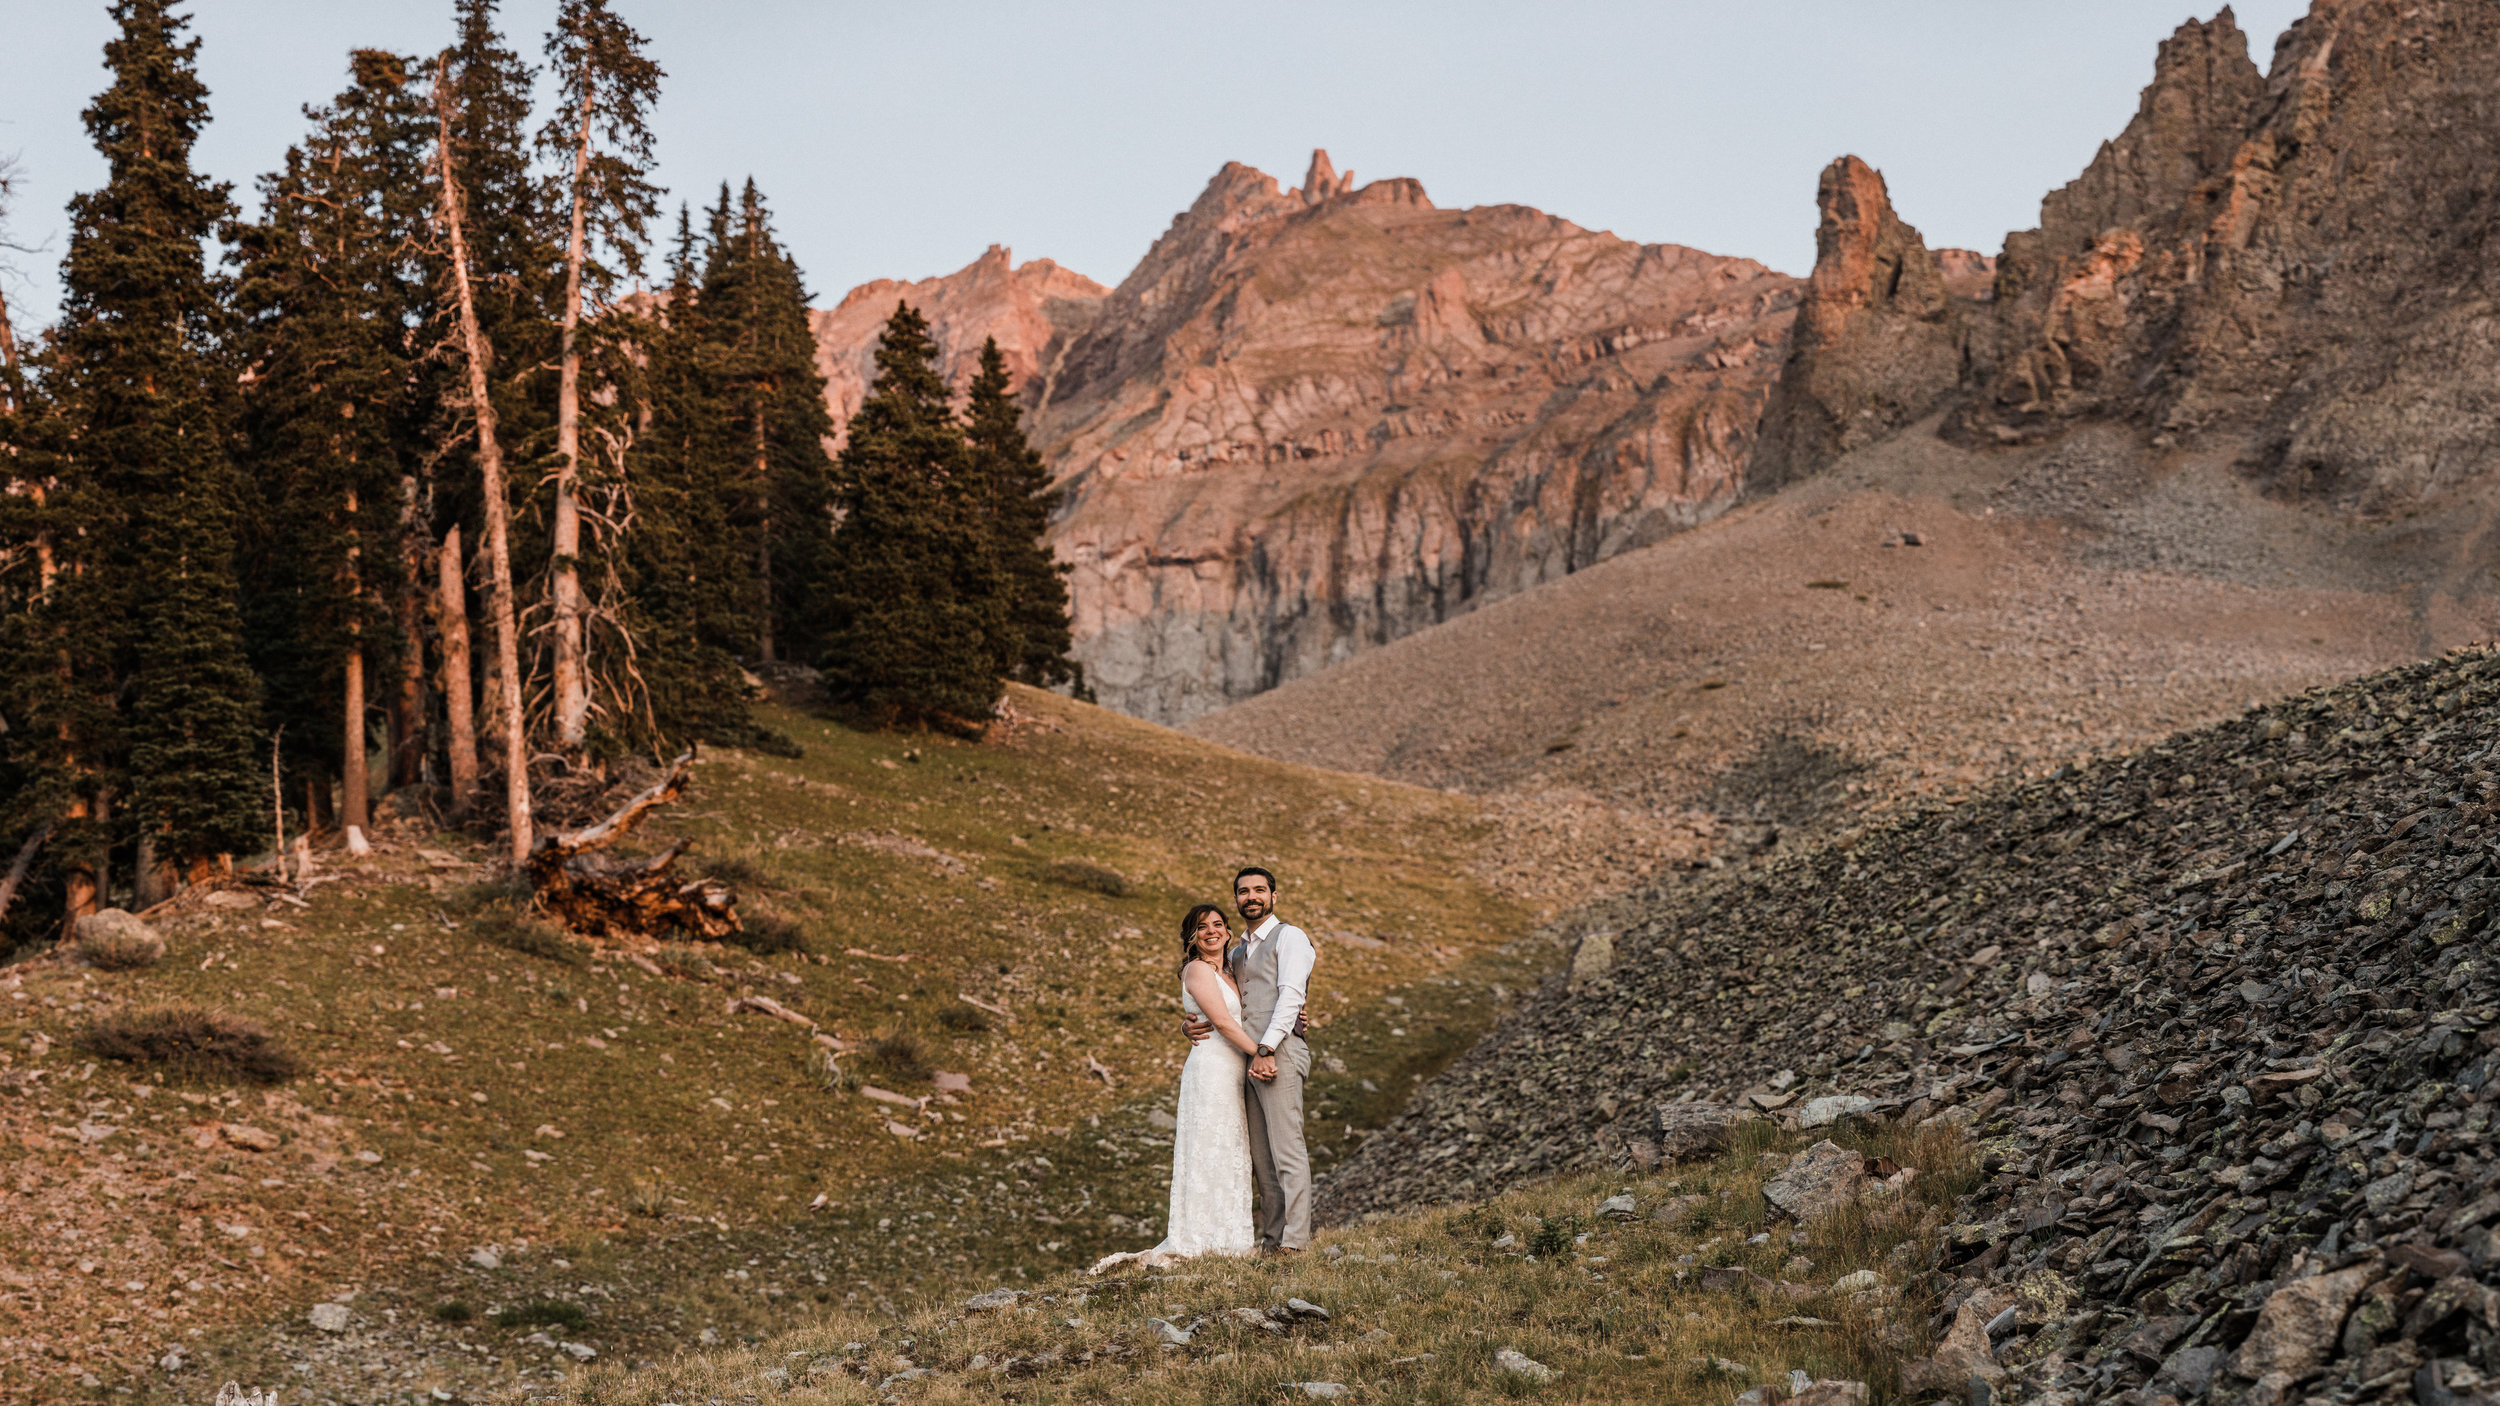 SB-leahandashton-telluride-wedding-photography-0045.jpg